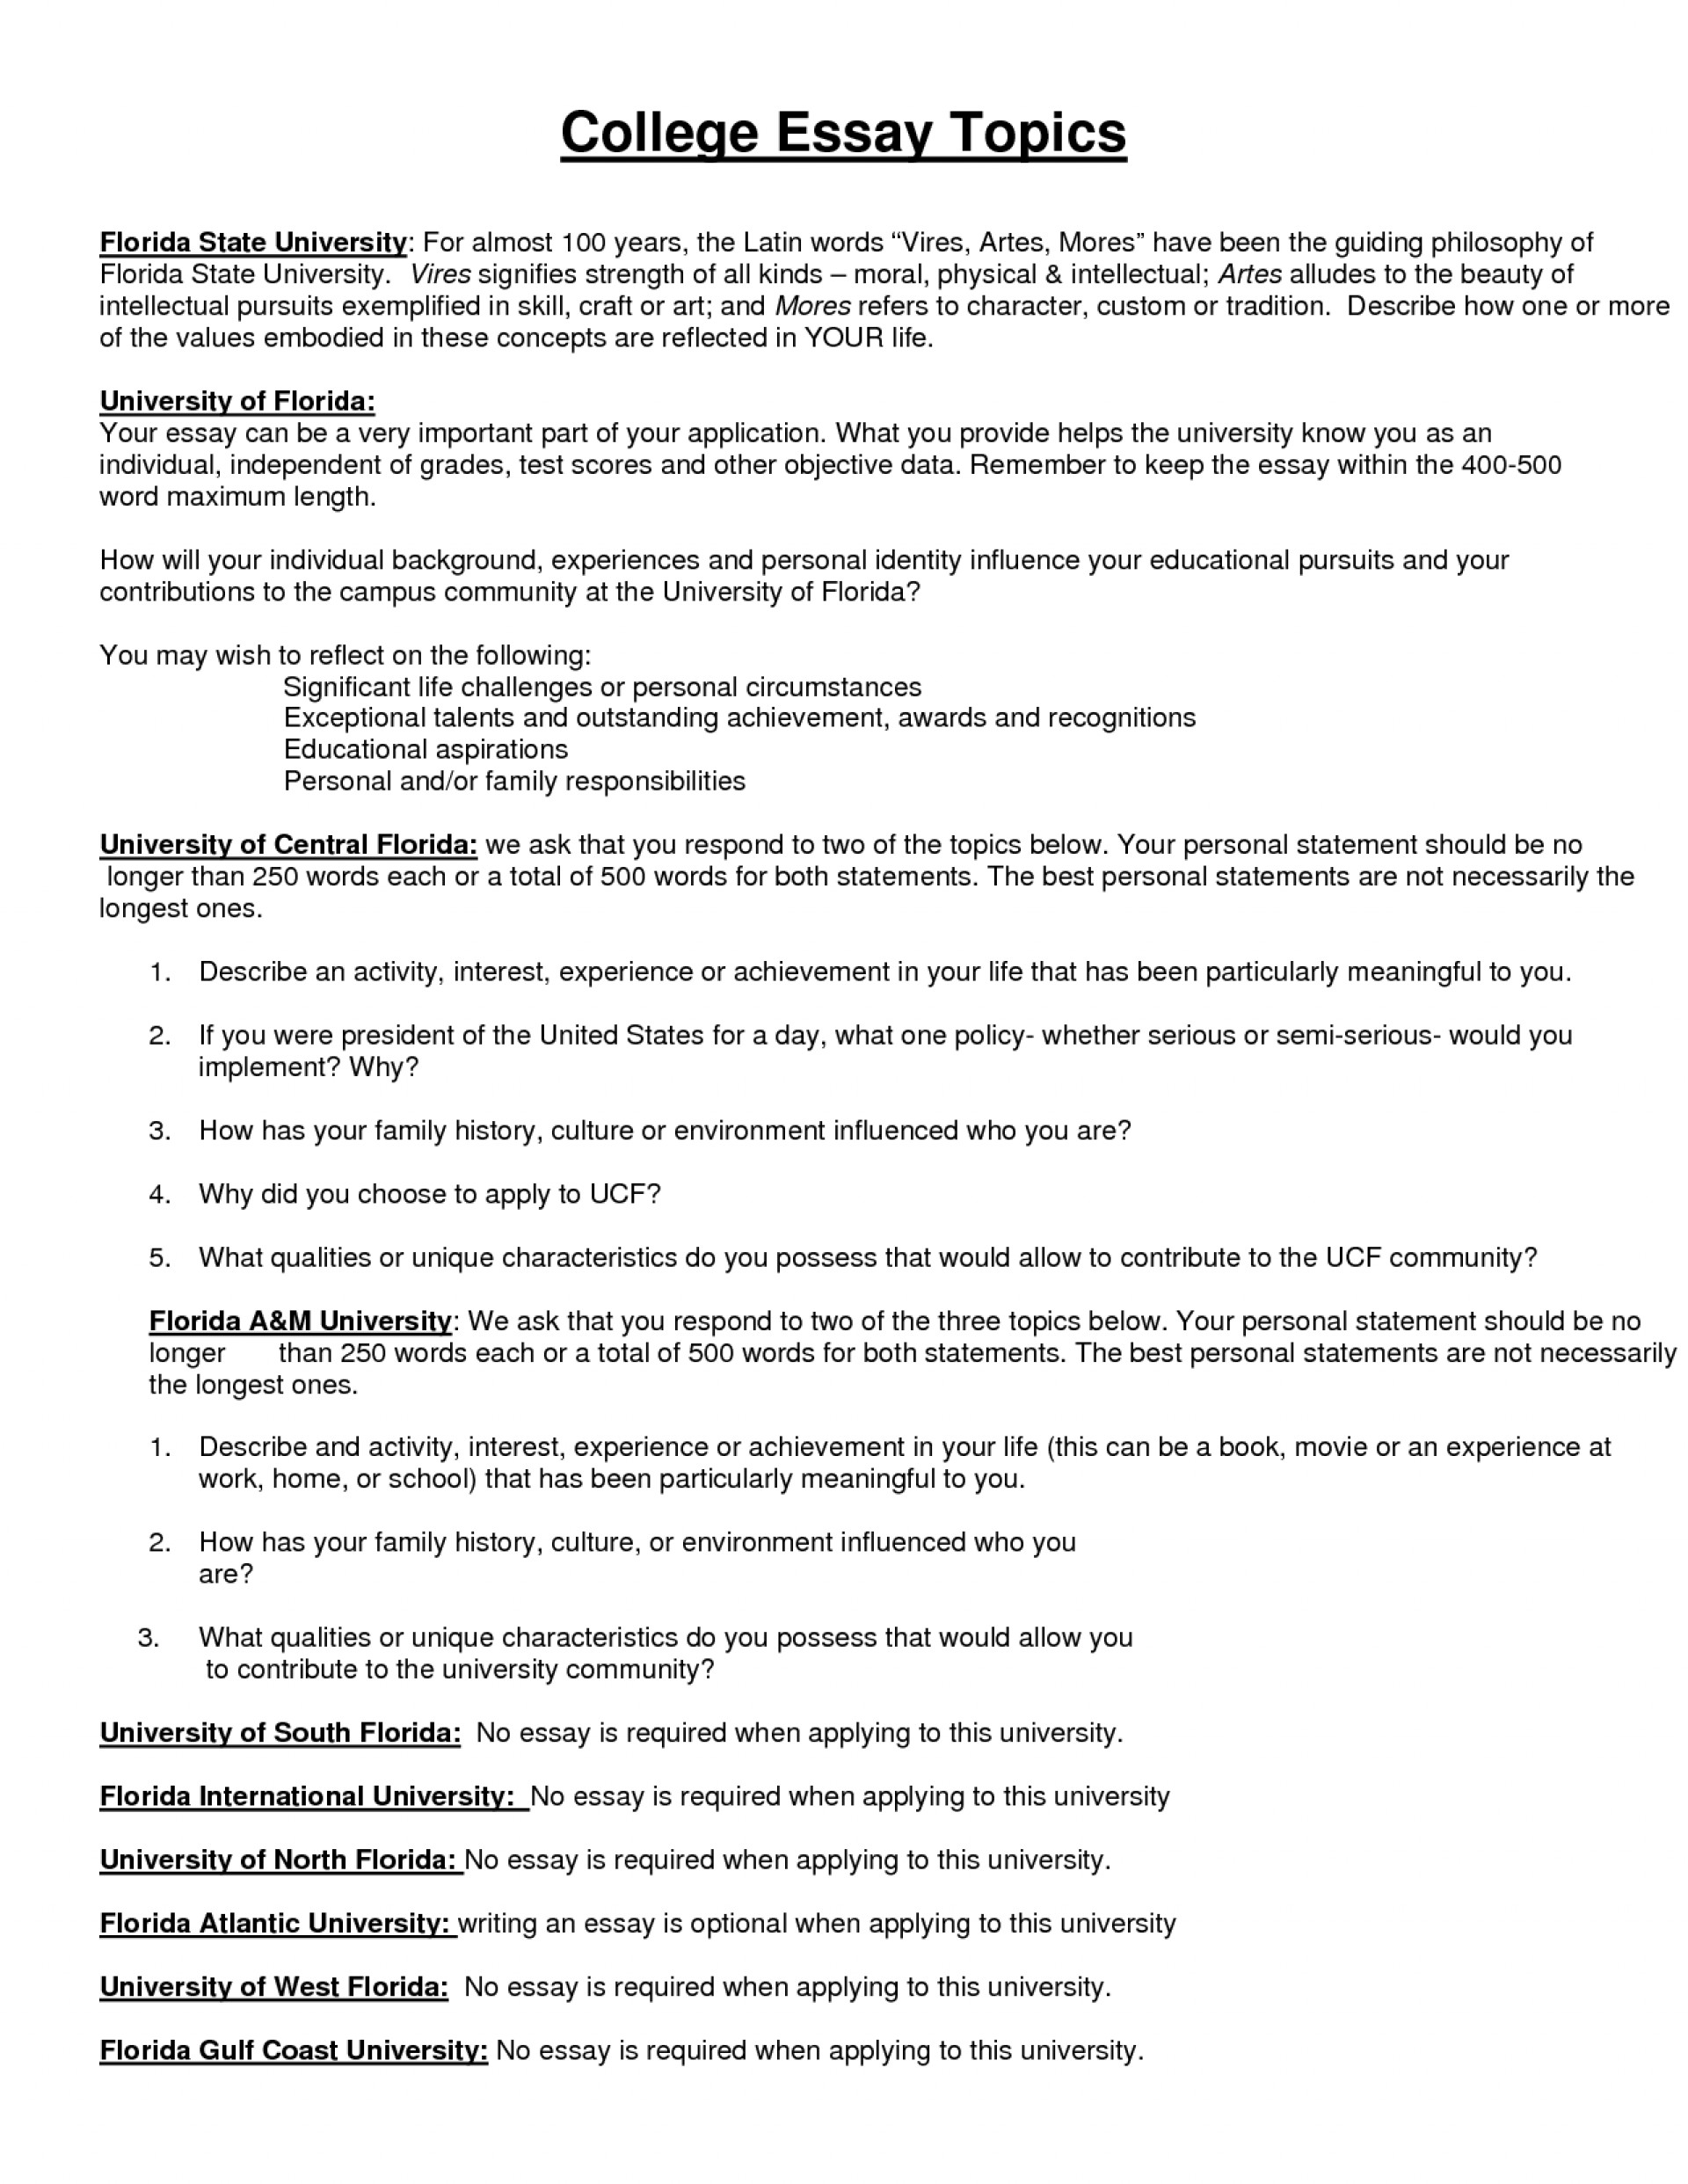 003 Essay Example 4khqbt5dlt Creative College Marvelous Topics List Interesting 2018 1920